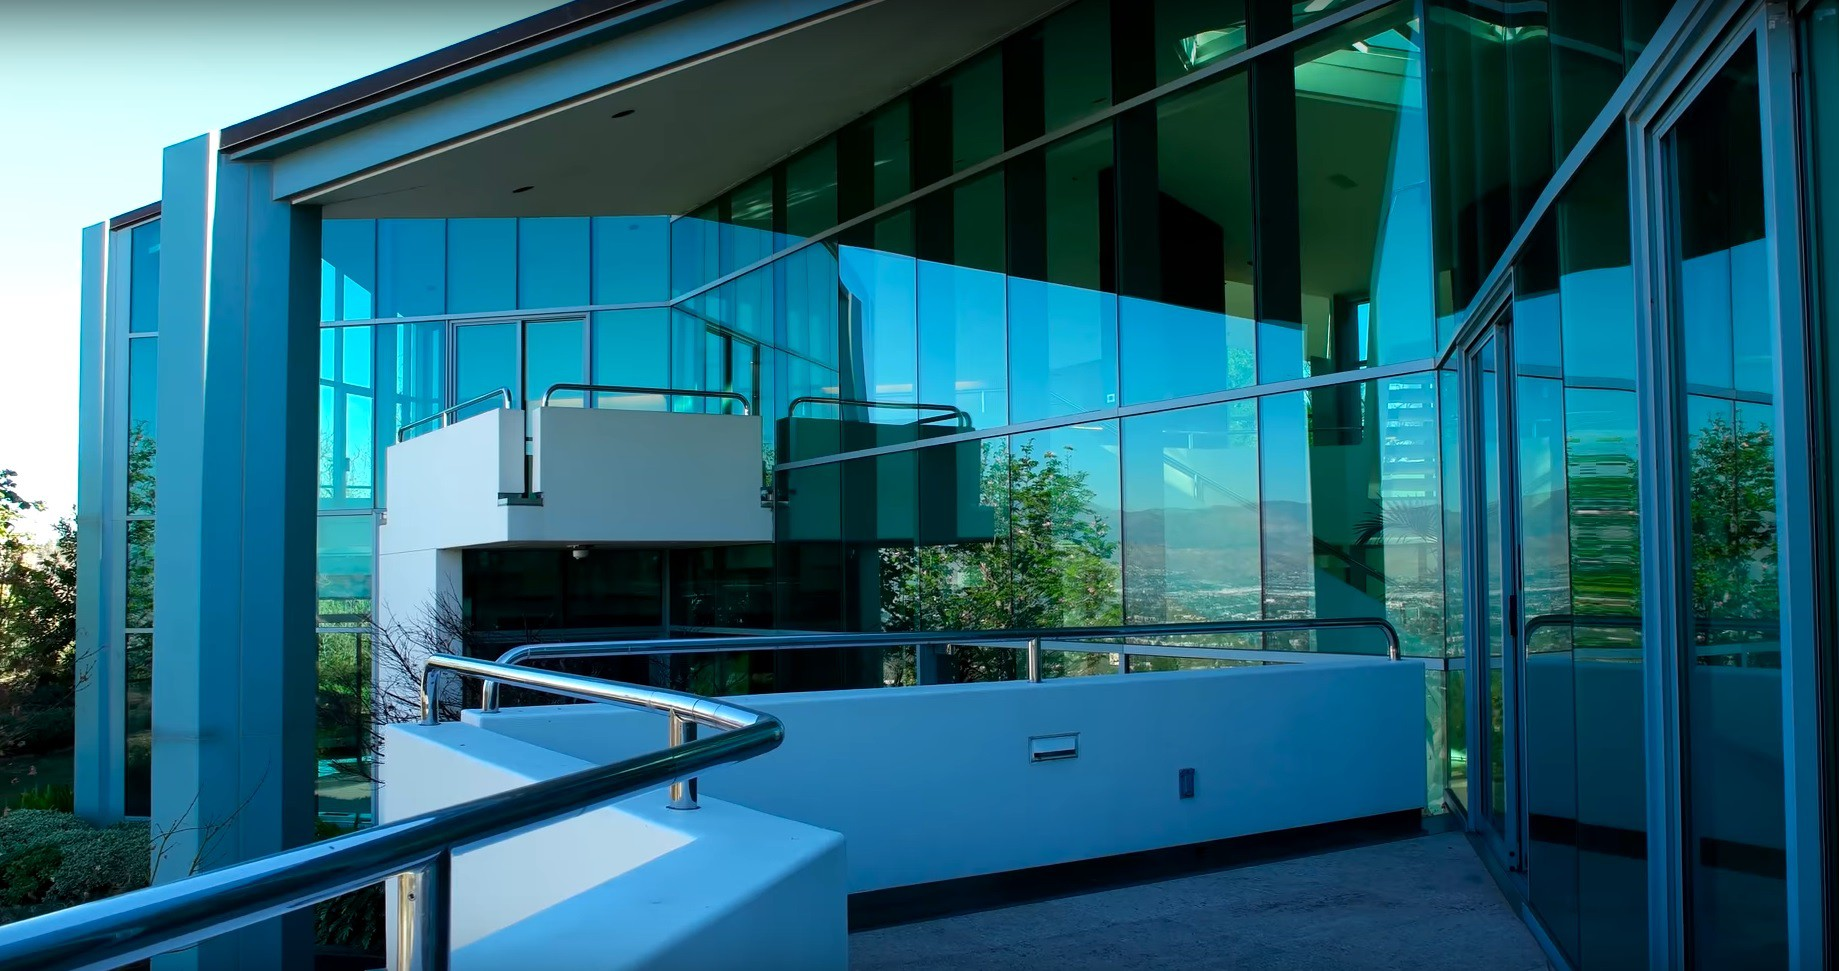 Pharrell Williams' balconies